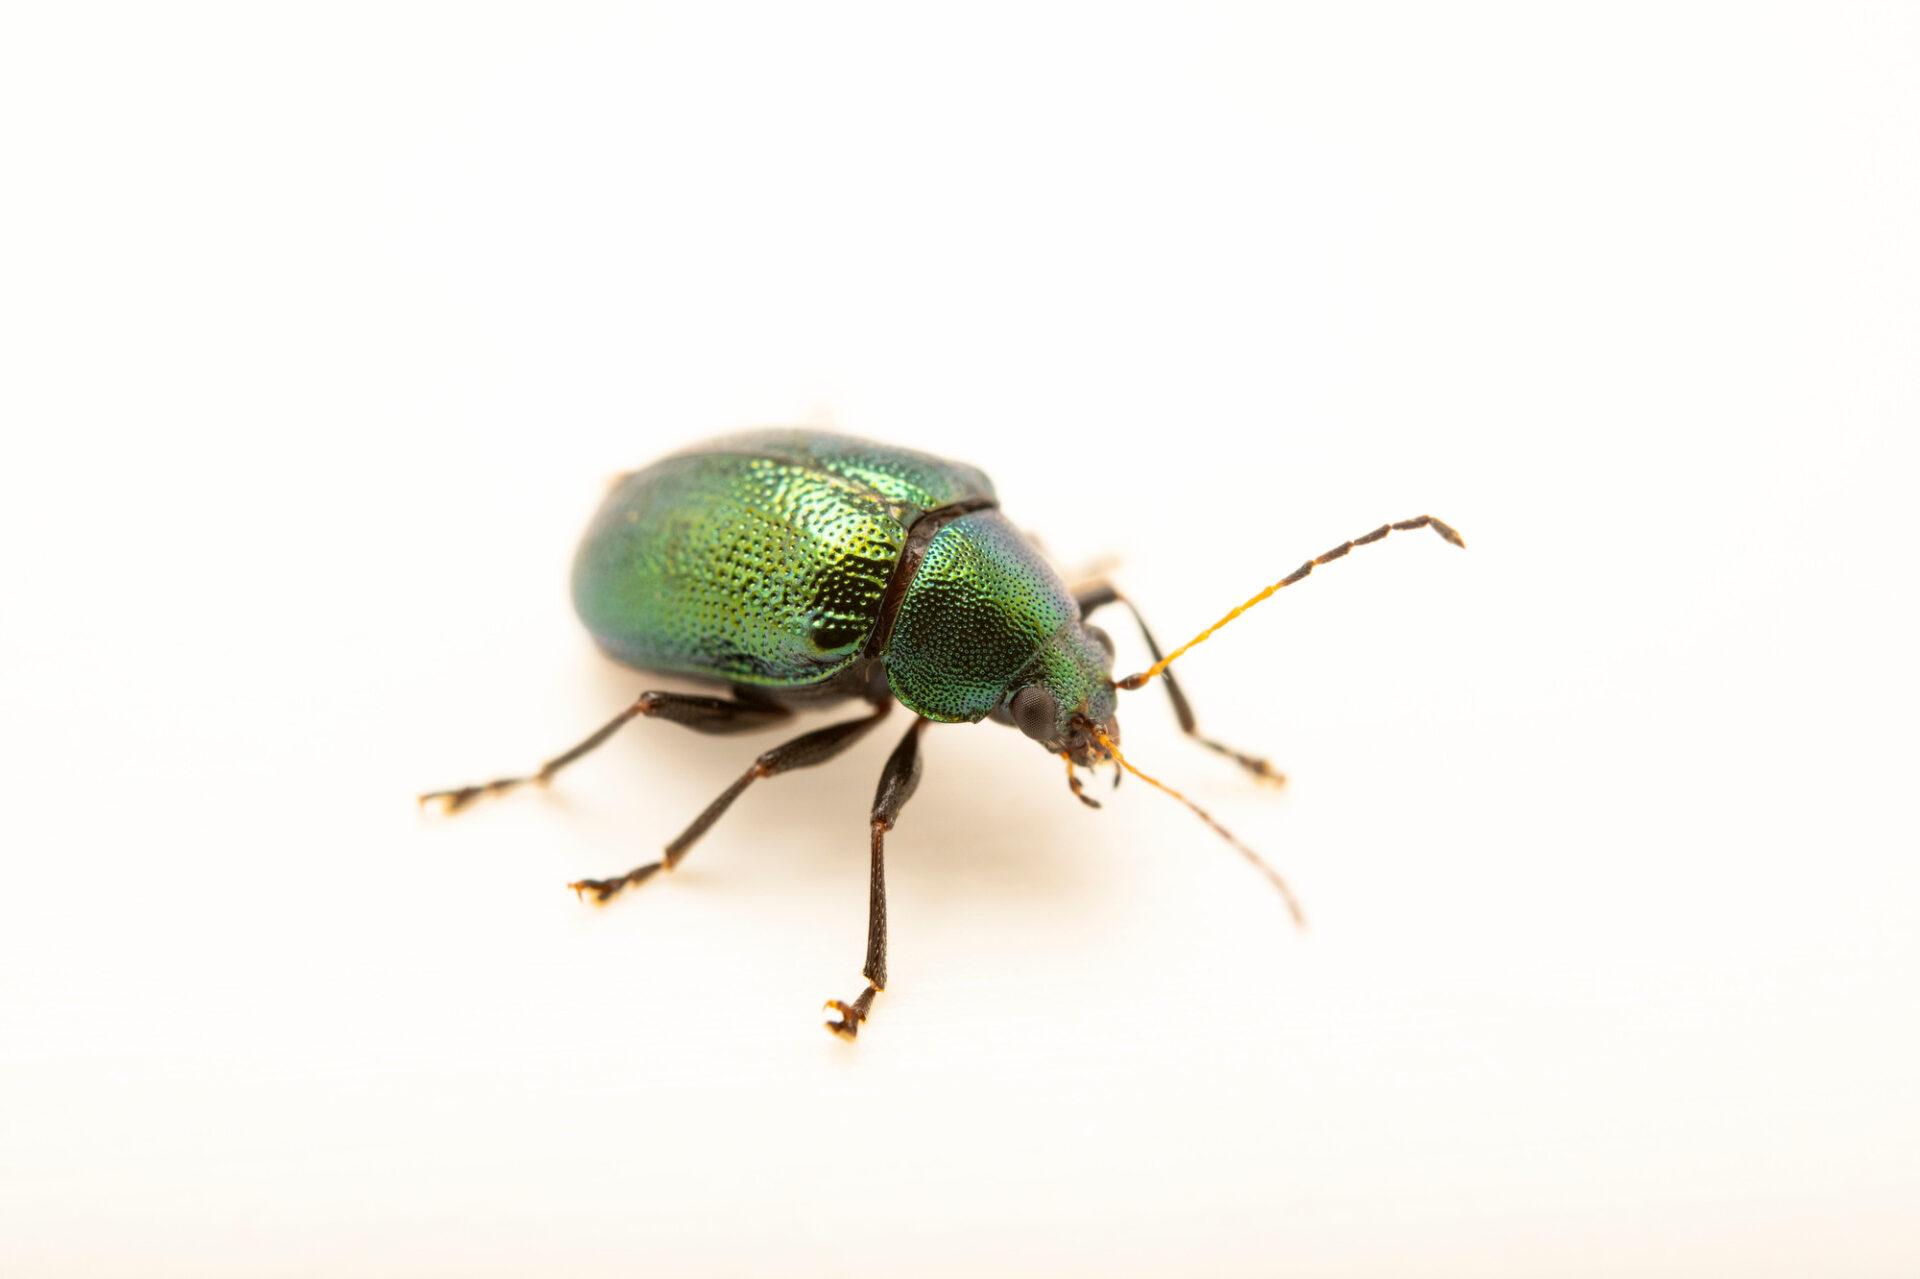 Photo: A leaf beetle (Colaspis favosa) photographed at Spring Creek Prairie Audubon Center near Denton, NE. This animal was originally collected from Bobcat Prairie near Denton, NE.